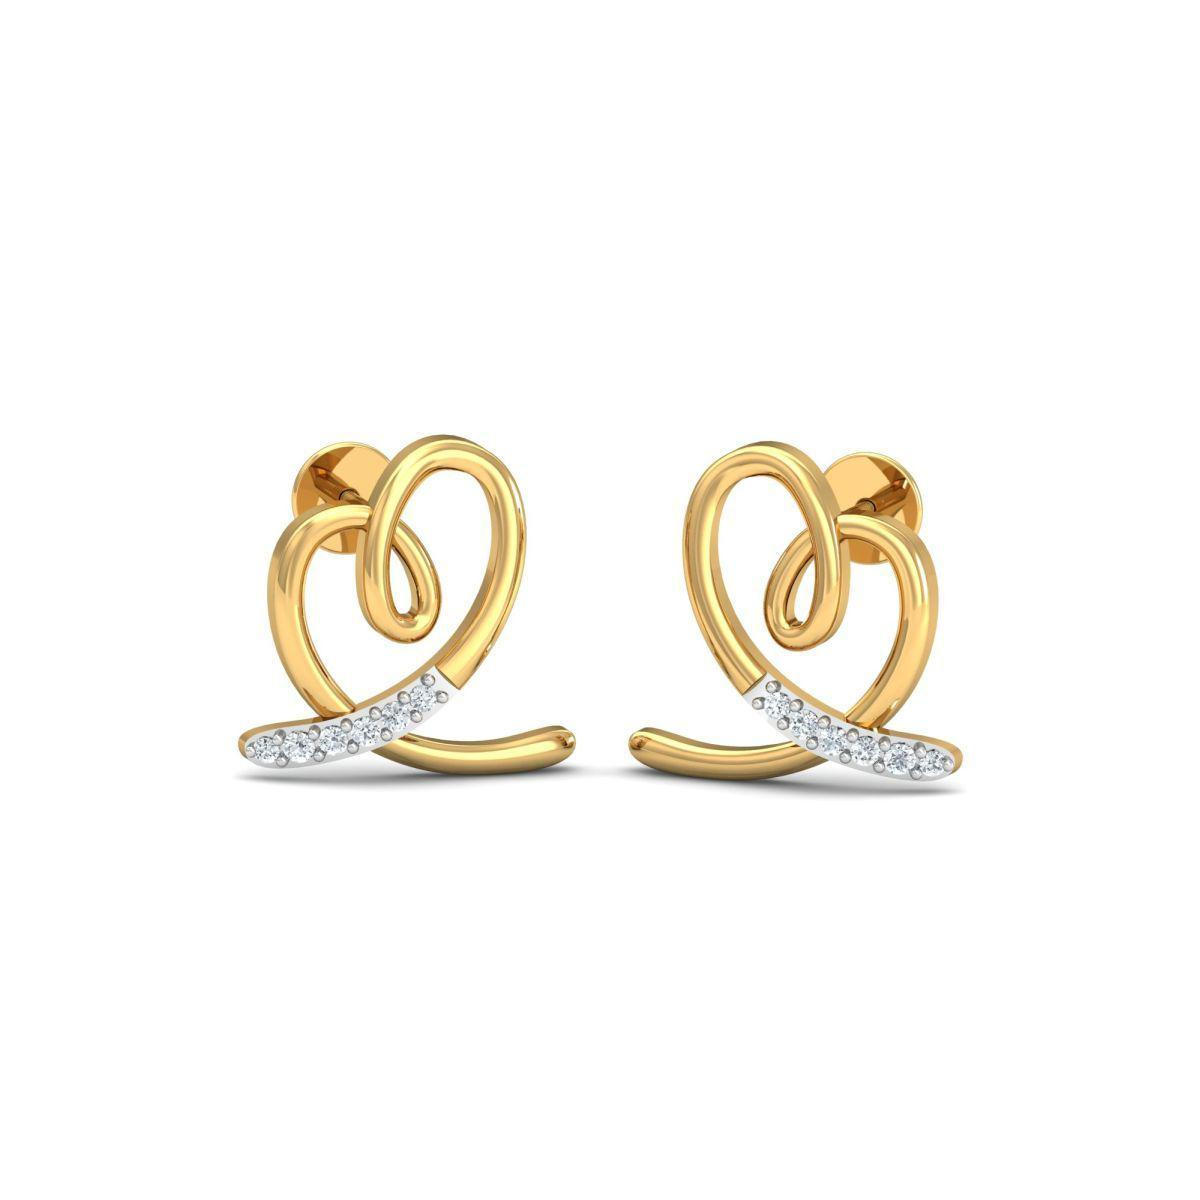 Diamoire Jewels 18kt Yellow Gold 0.07ct Pave Diamond Infinity Earrings II KTEJC0PF